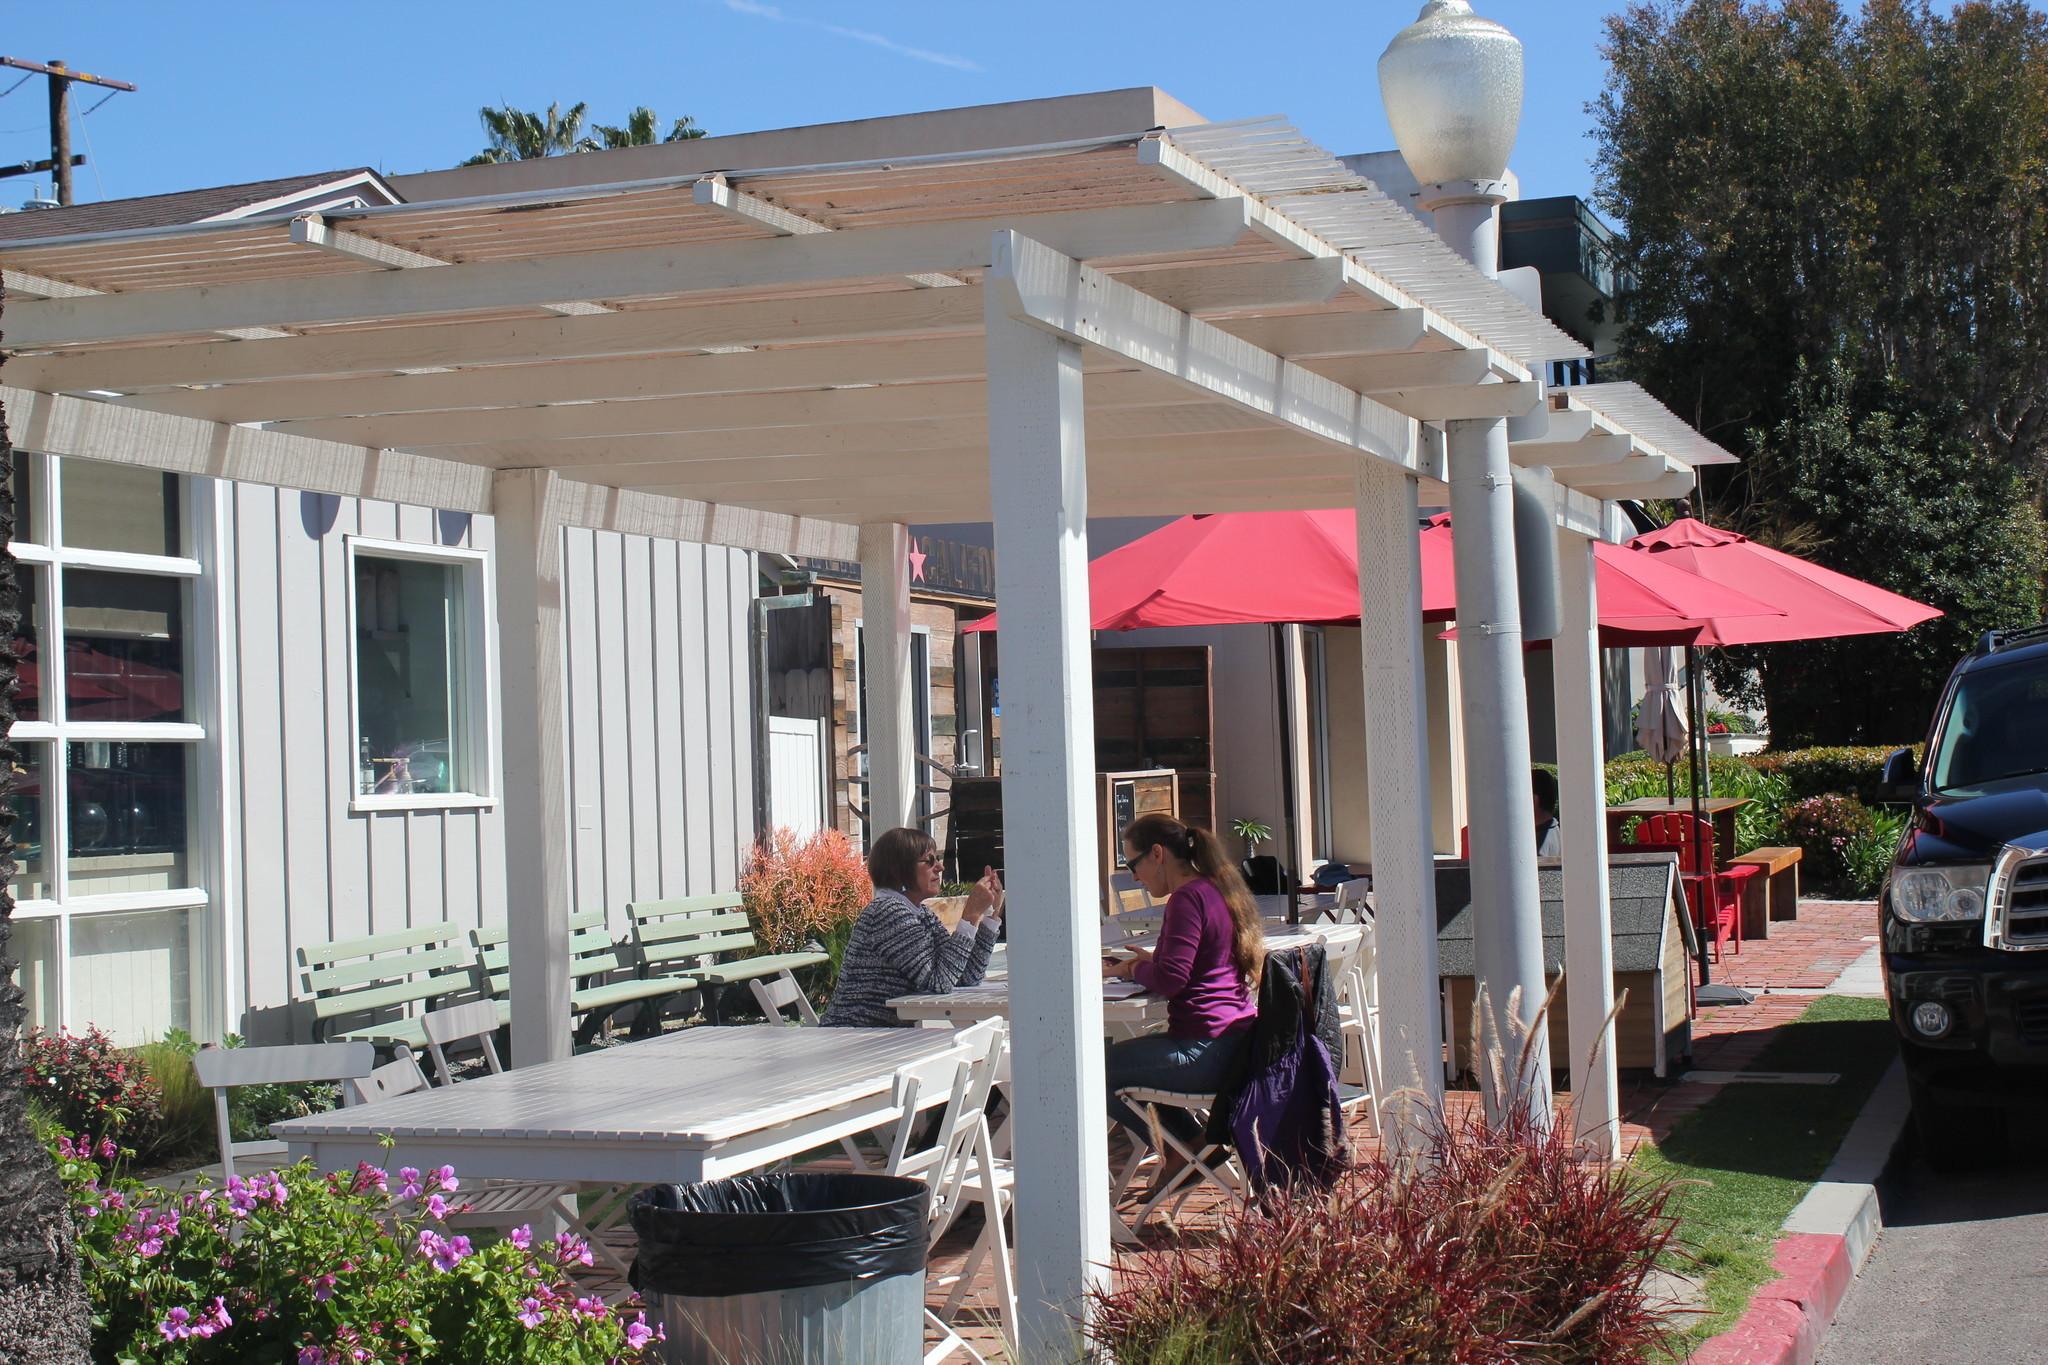 Shorehouse Kitchen trellis can stay in La Jolla, says board - La ...